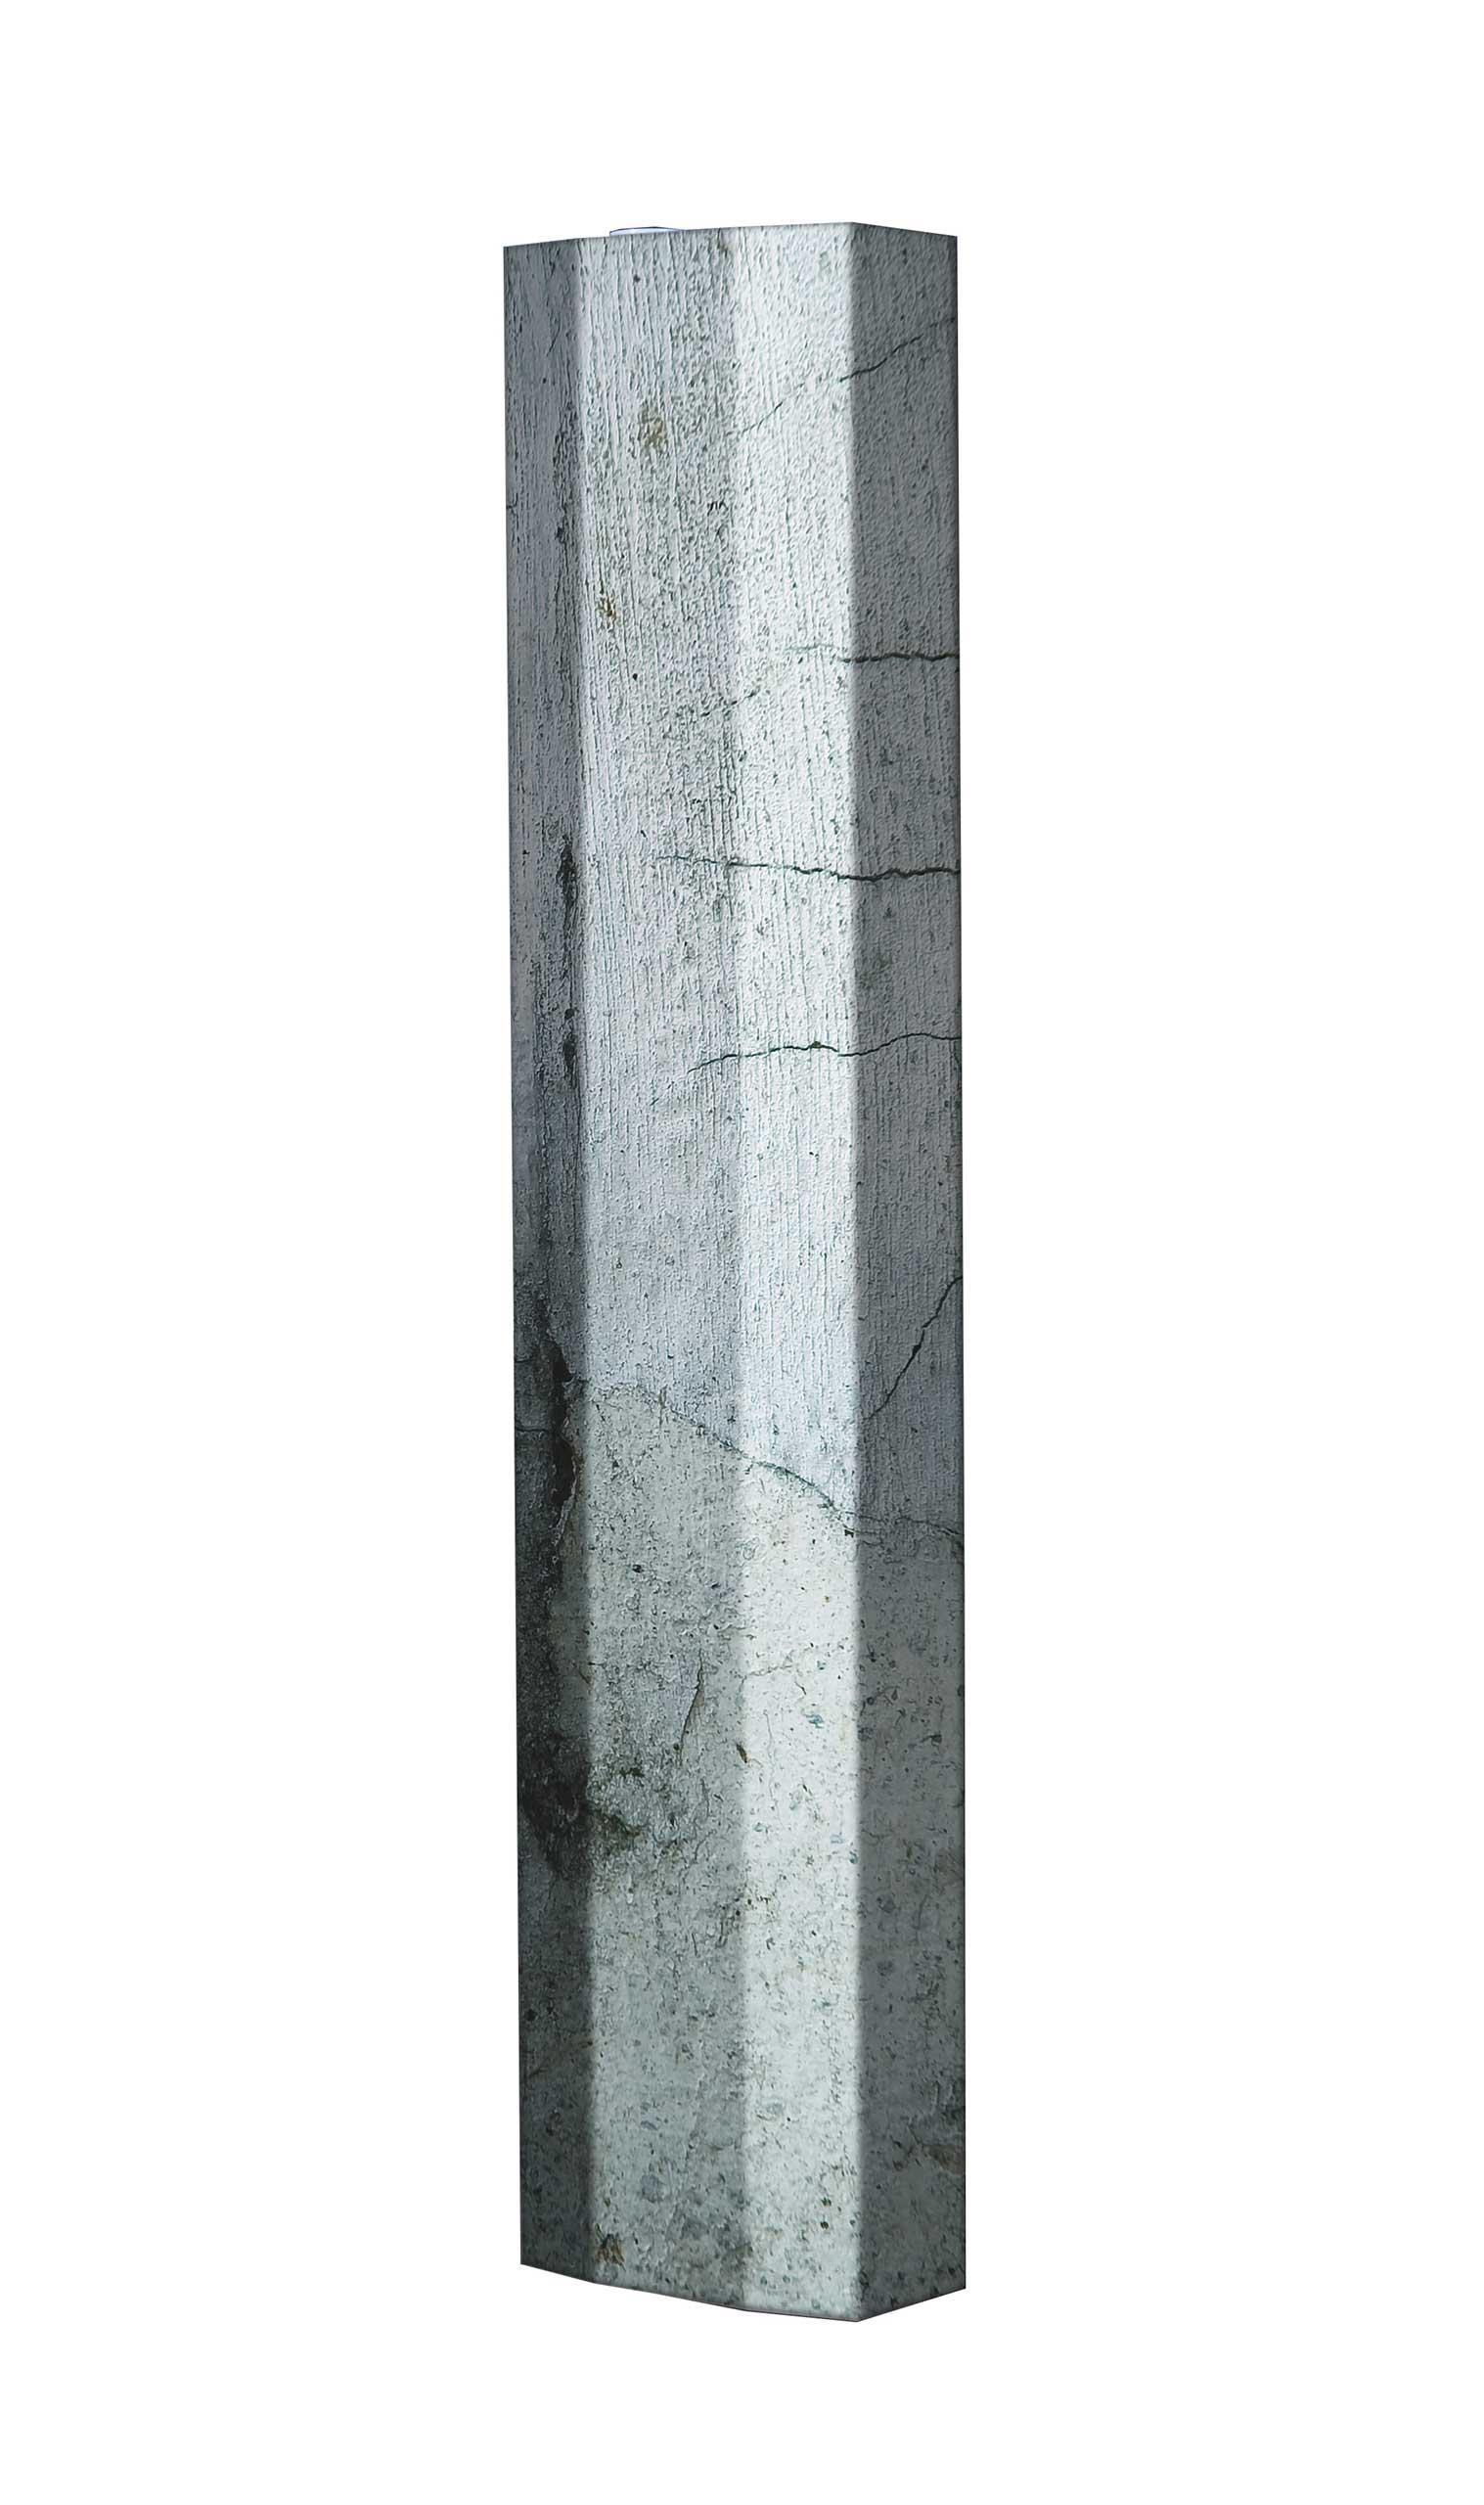 Schuhschrank STORM Motivschrank Single S07 Beton weiß